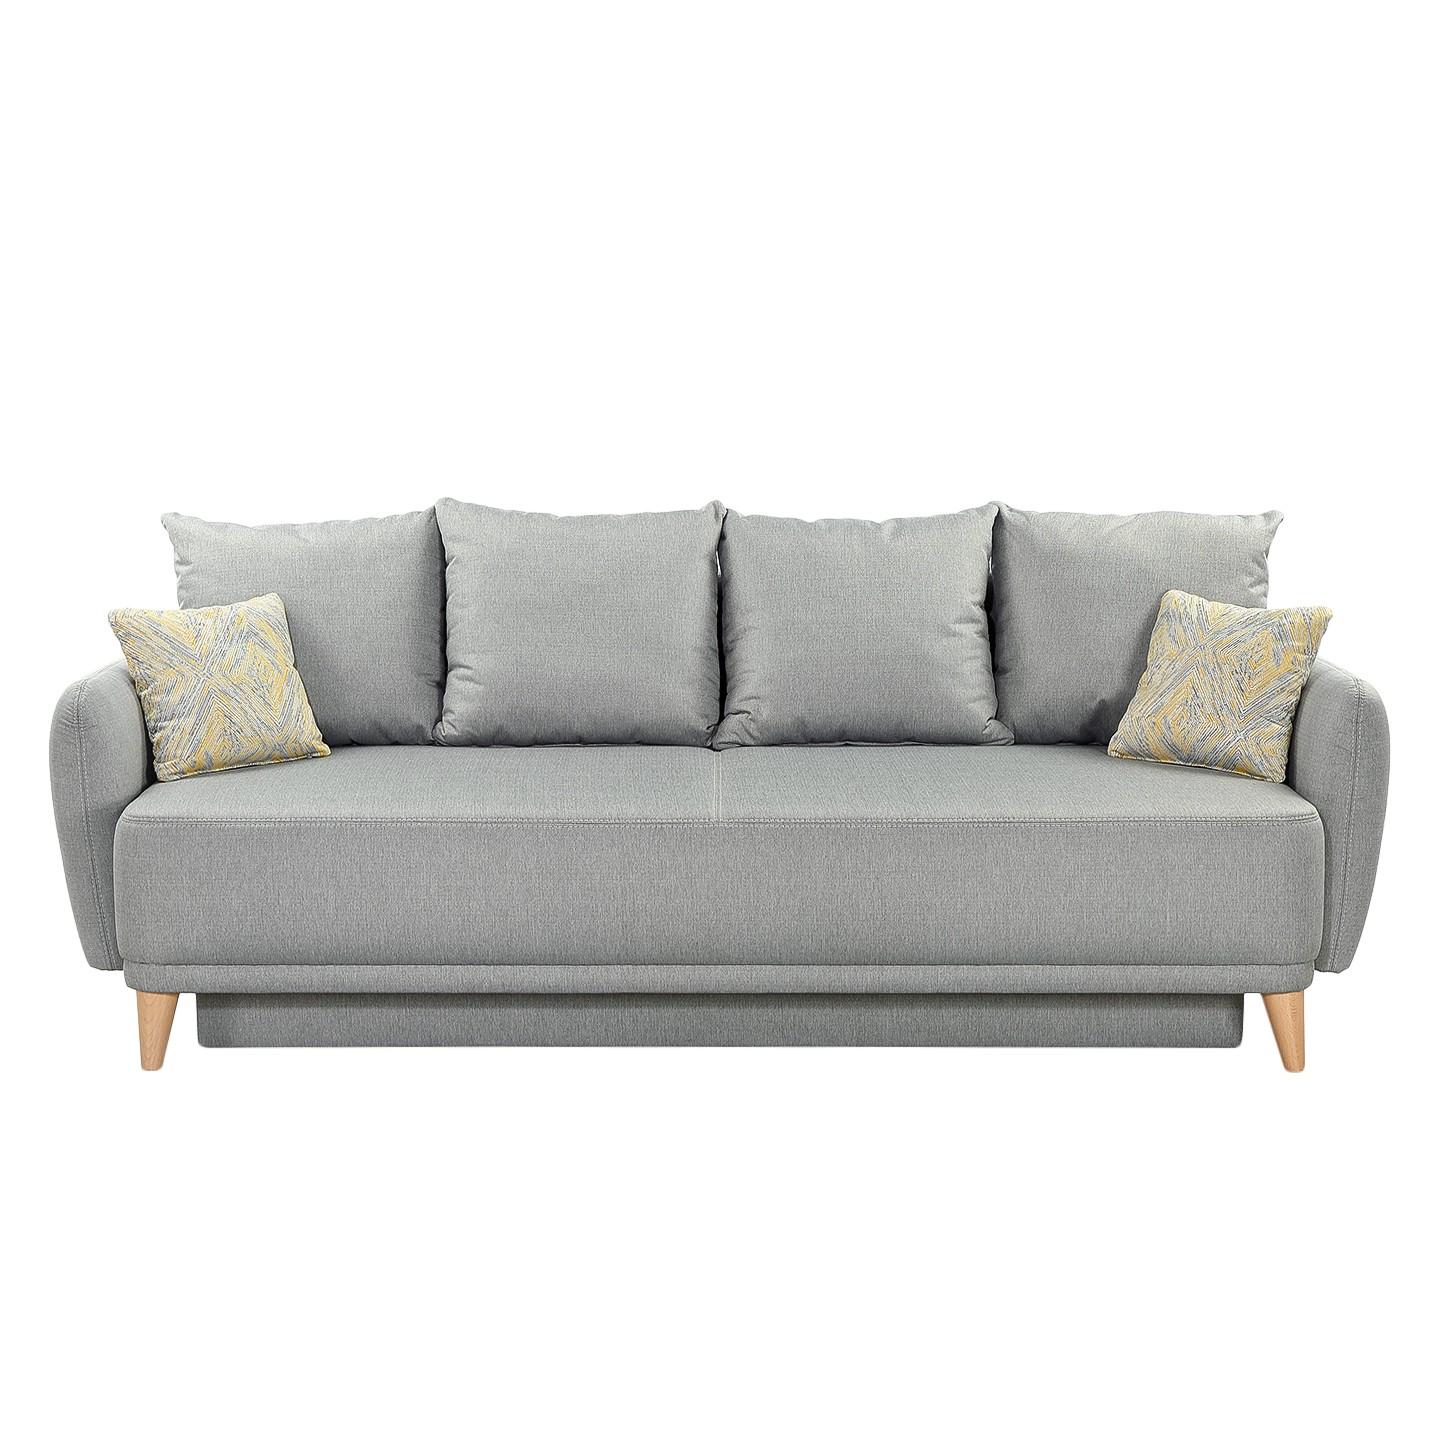 Schlafsofa Silvassa - Webstoff - Grau, Home Design